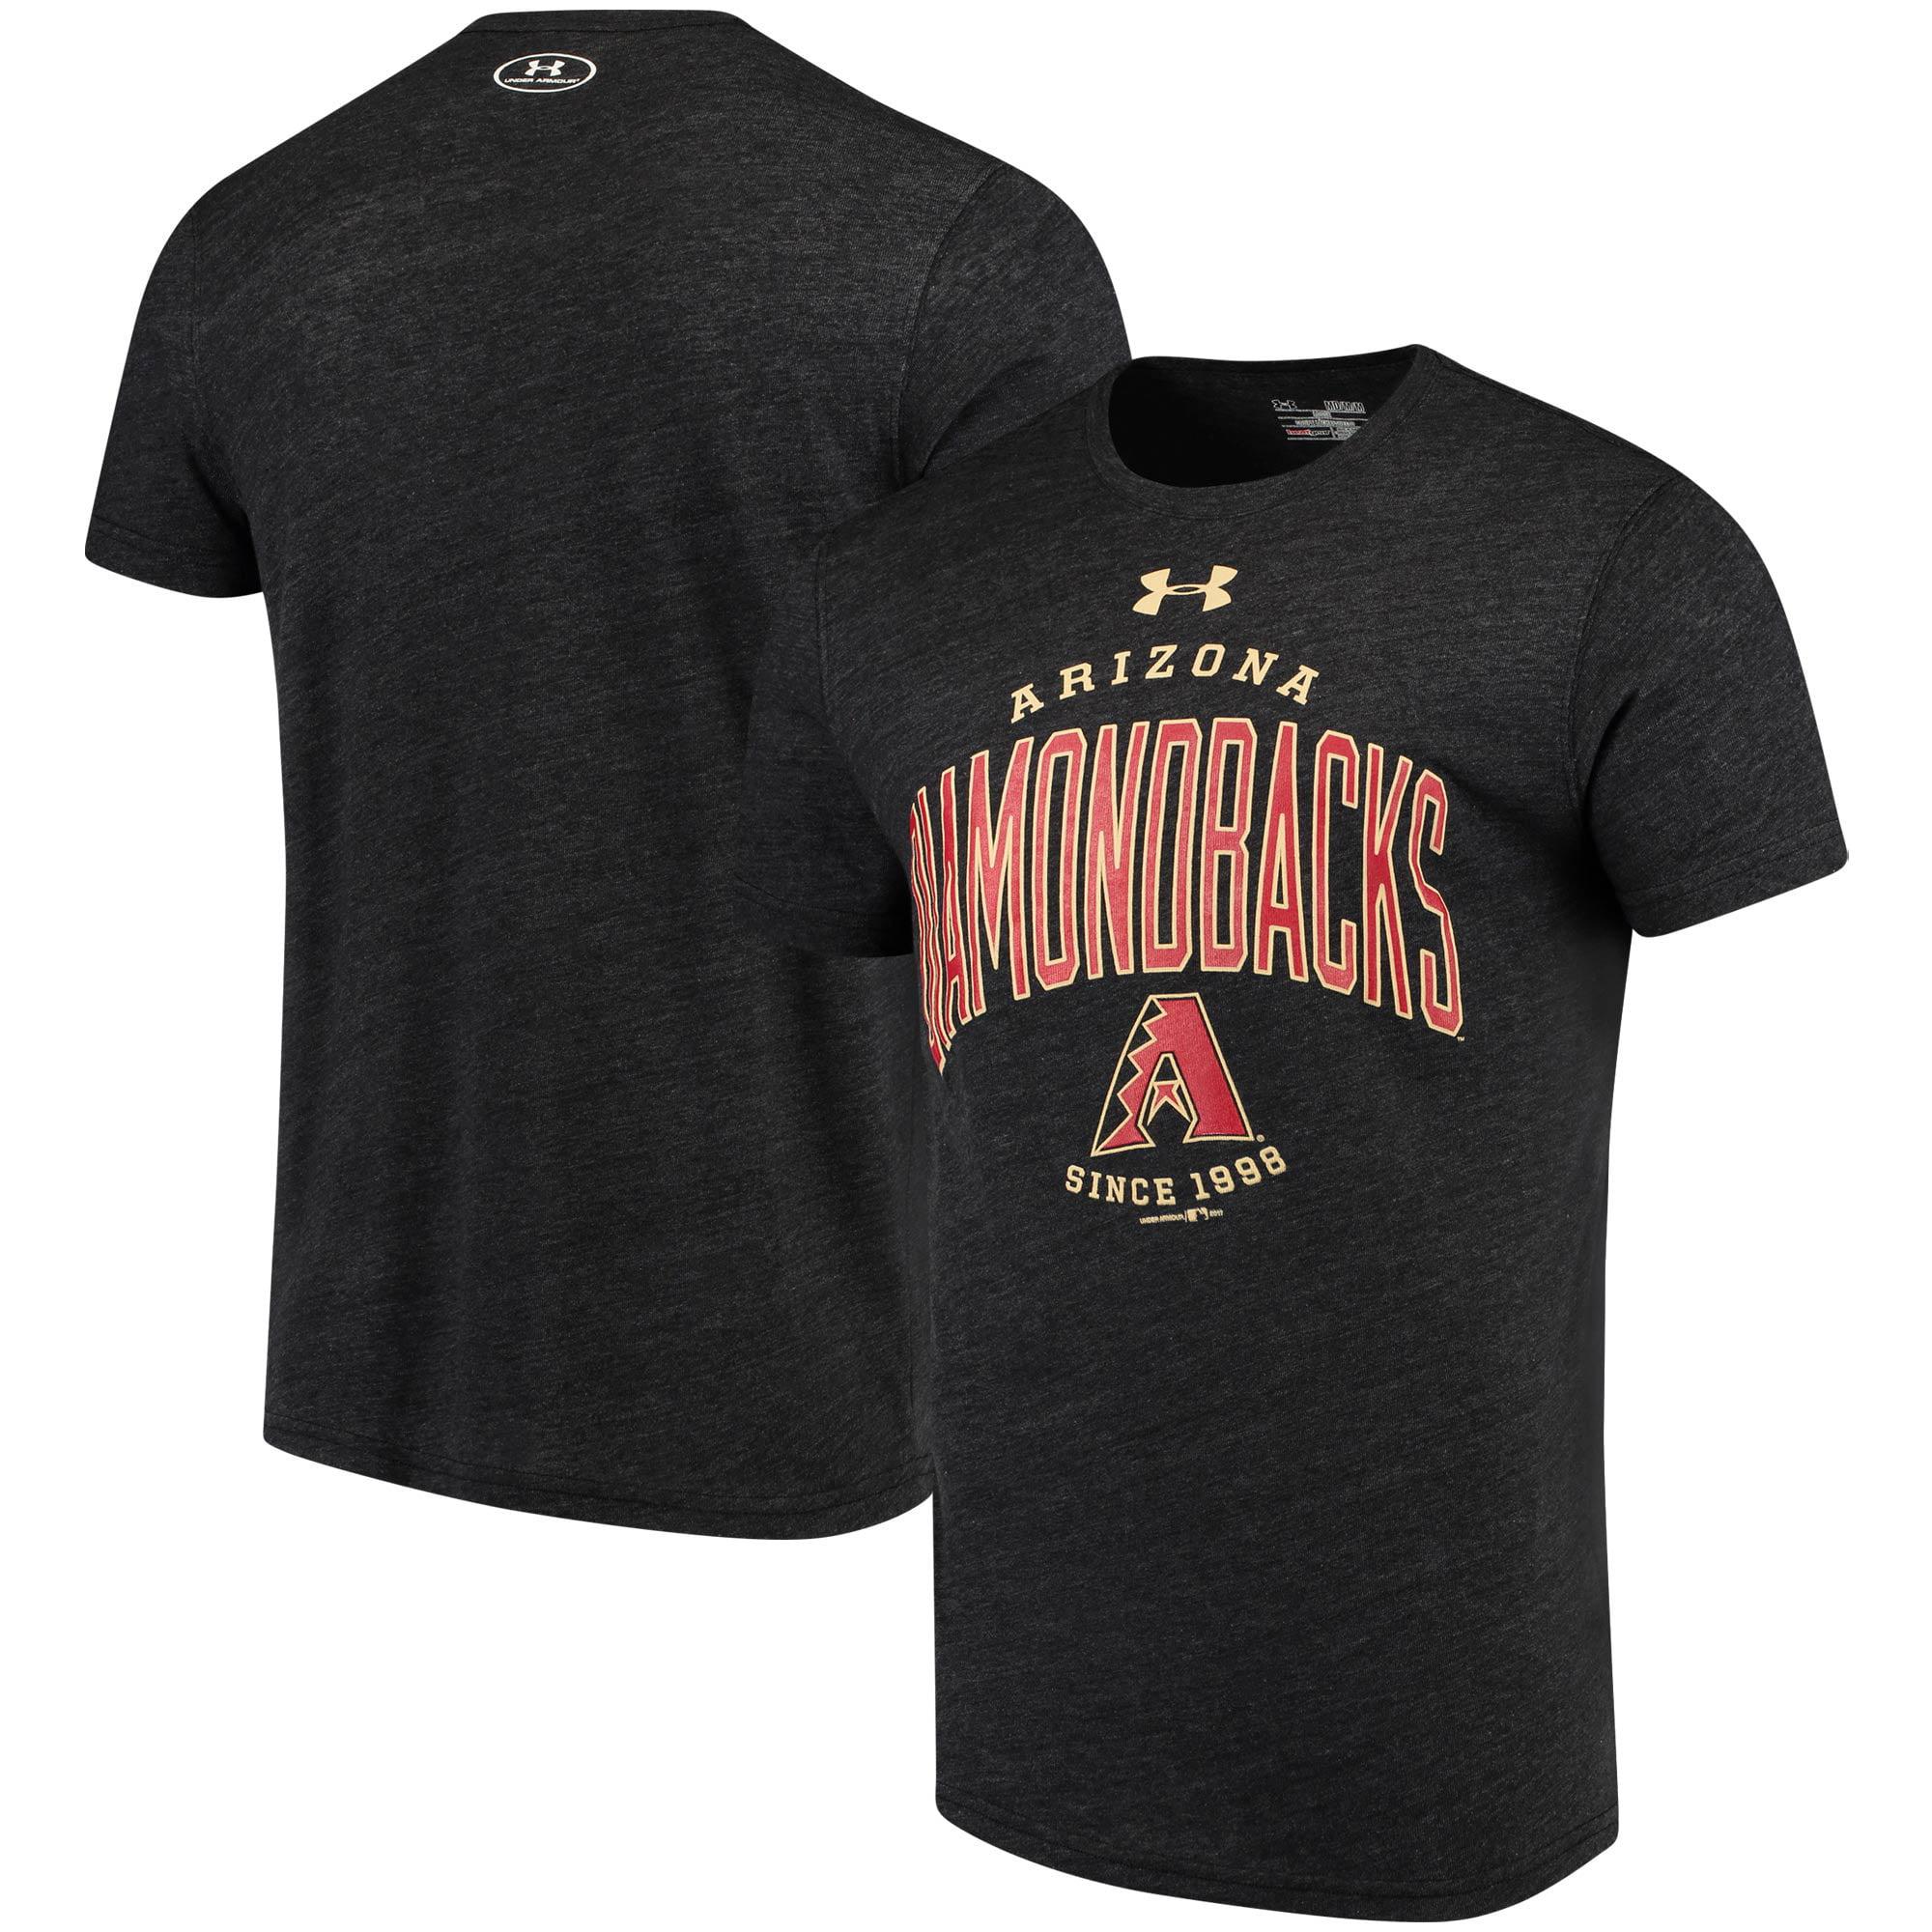 Arizona Diamondbacks Under Armour Team Logo Tri-Blend T-Shirt - Black